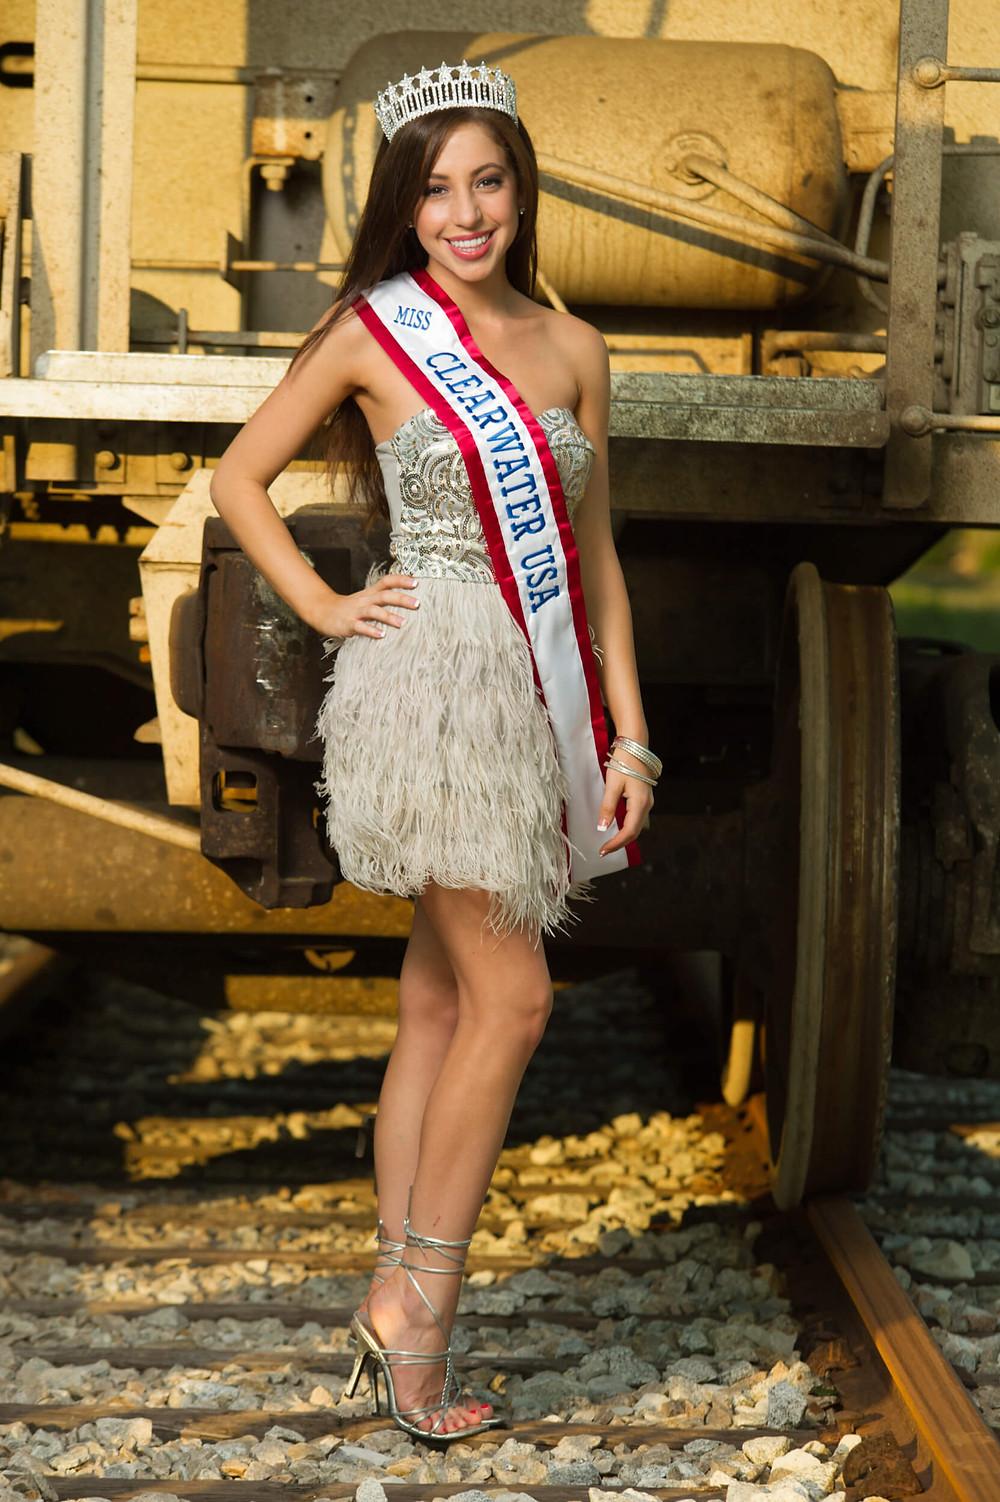 Cher Gopman Miss Clearwater 2013 1